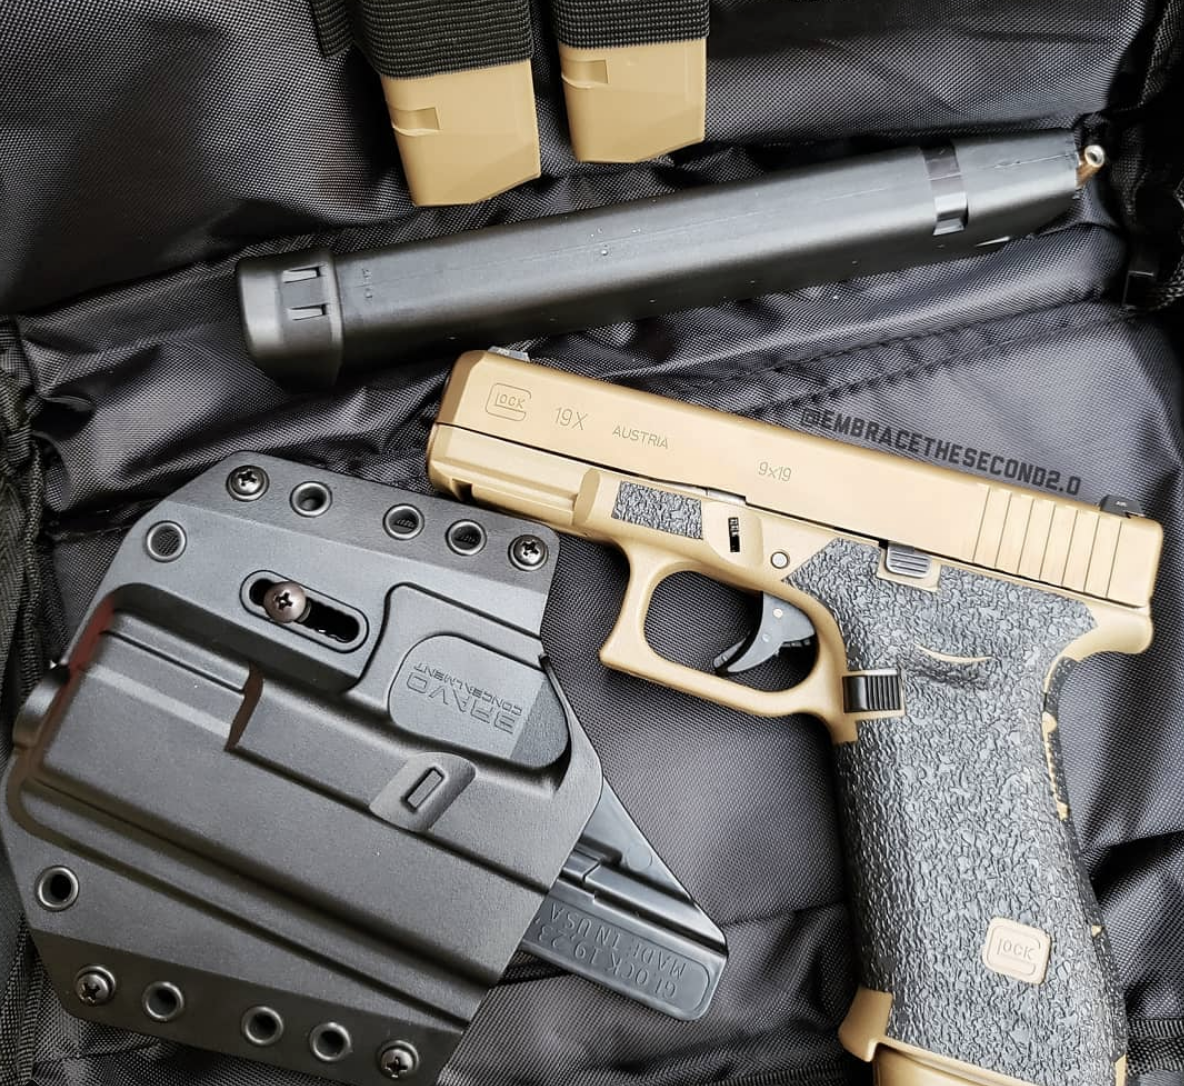 Best Open carry Handgun? Glock 19x for me! 19 round mag